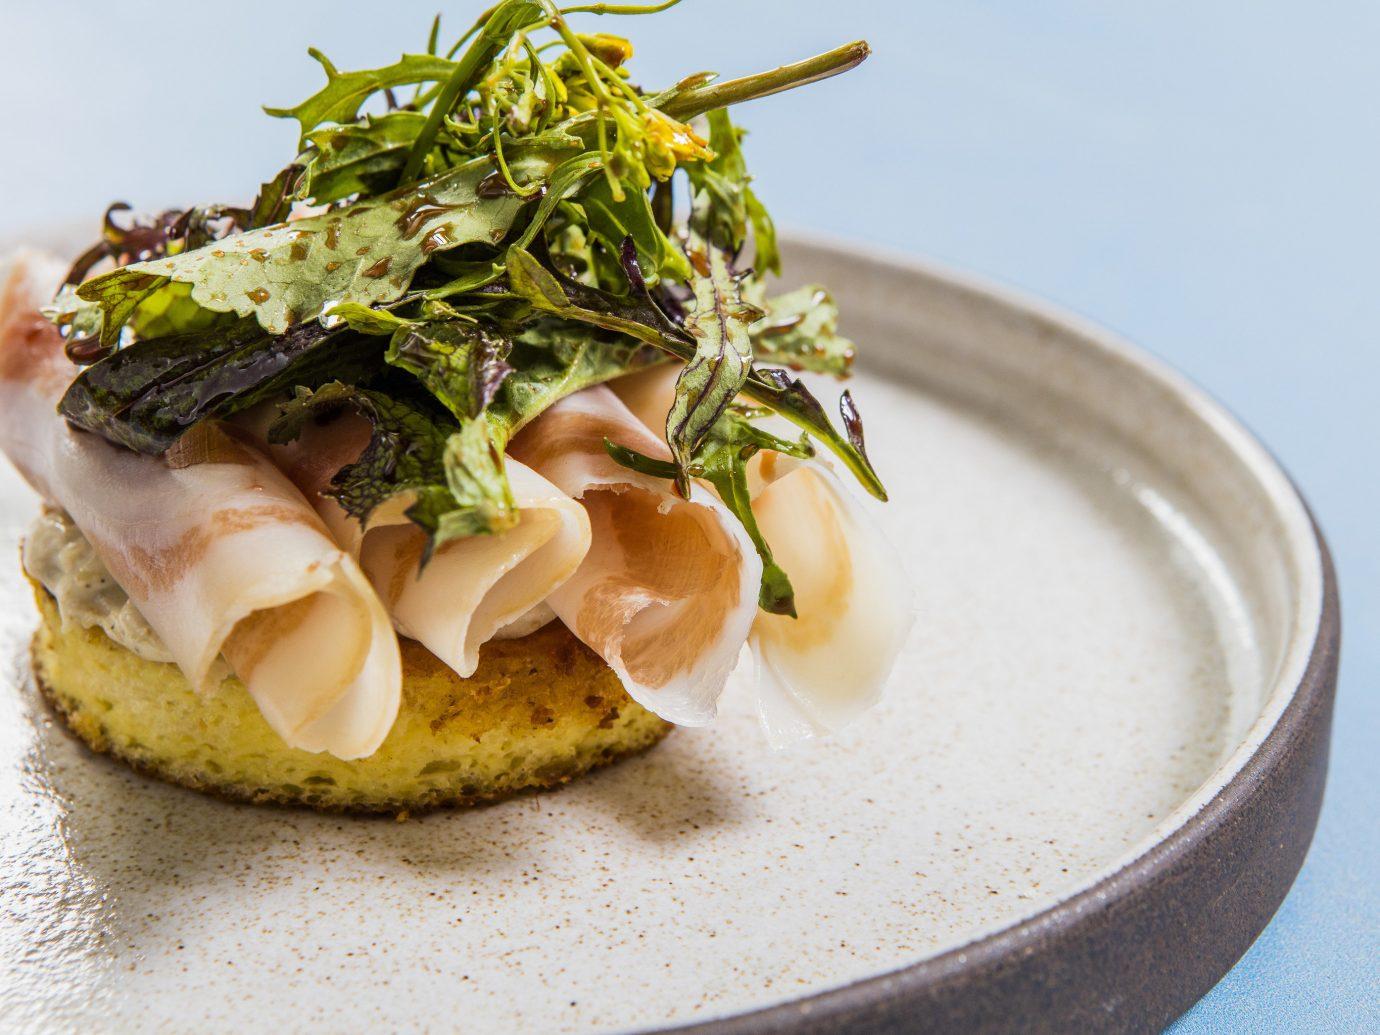 Hotels Iceland food dish plate cuisine meal produce breakfast dessert sliced